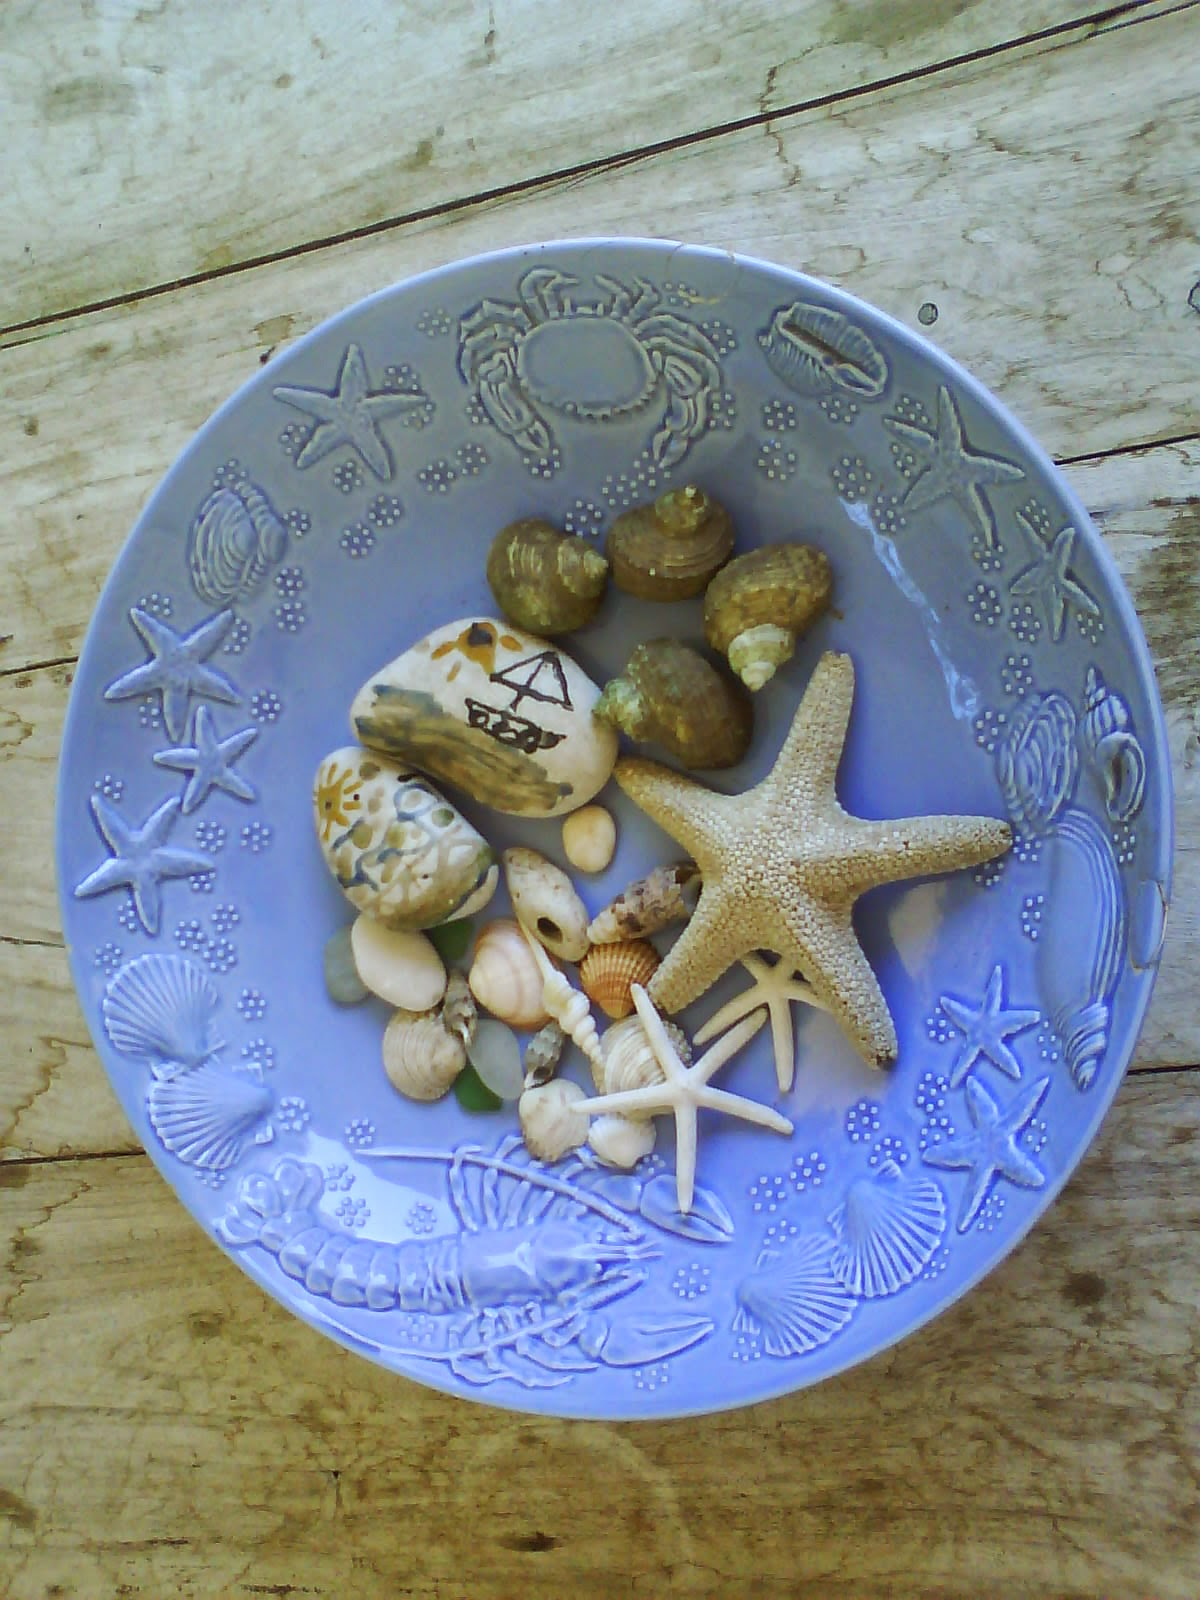 Pebbles and sea shells